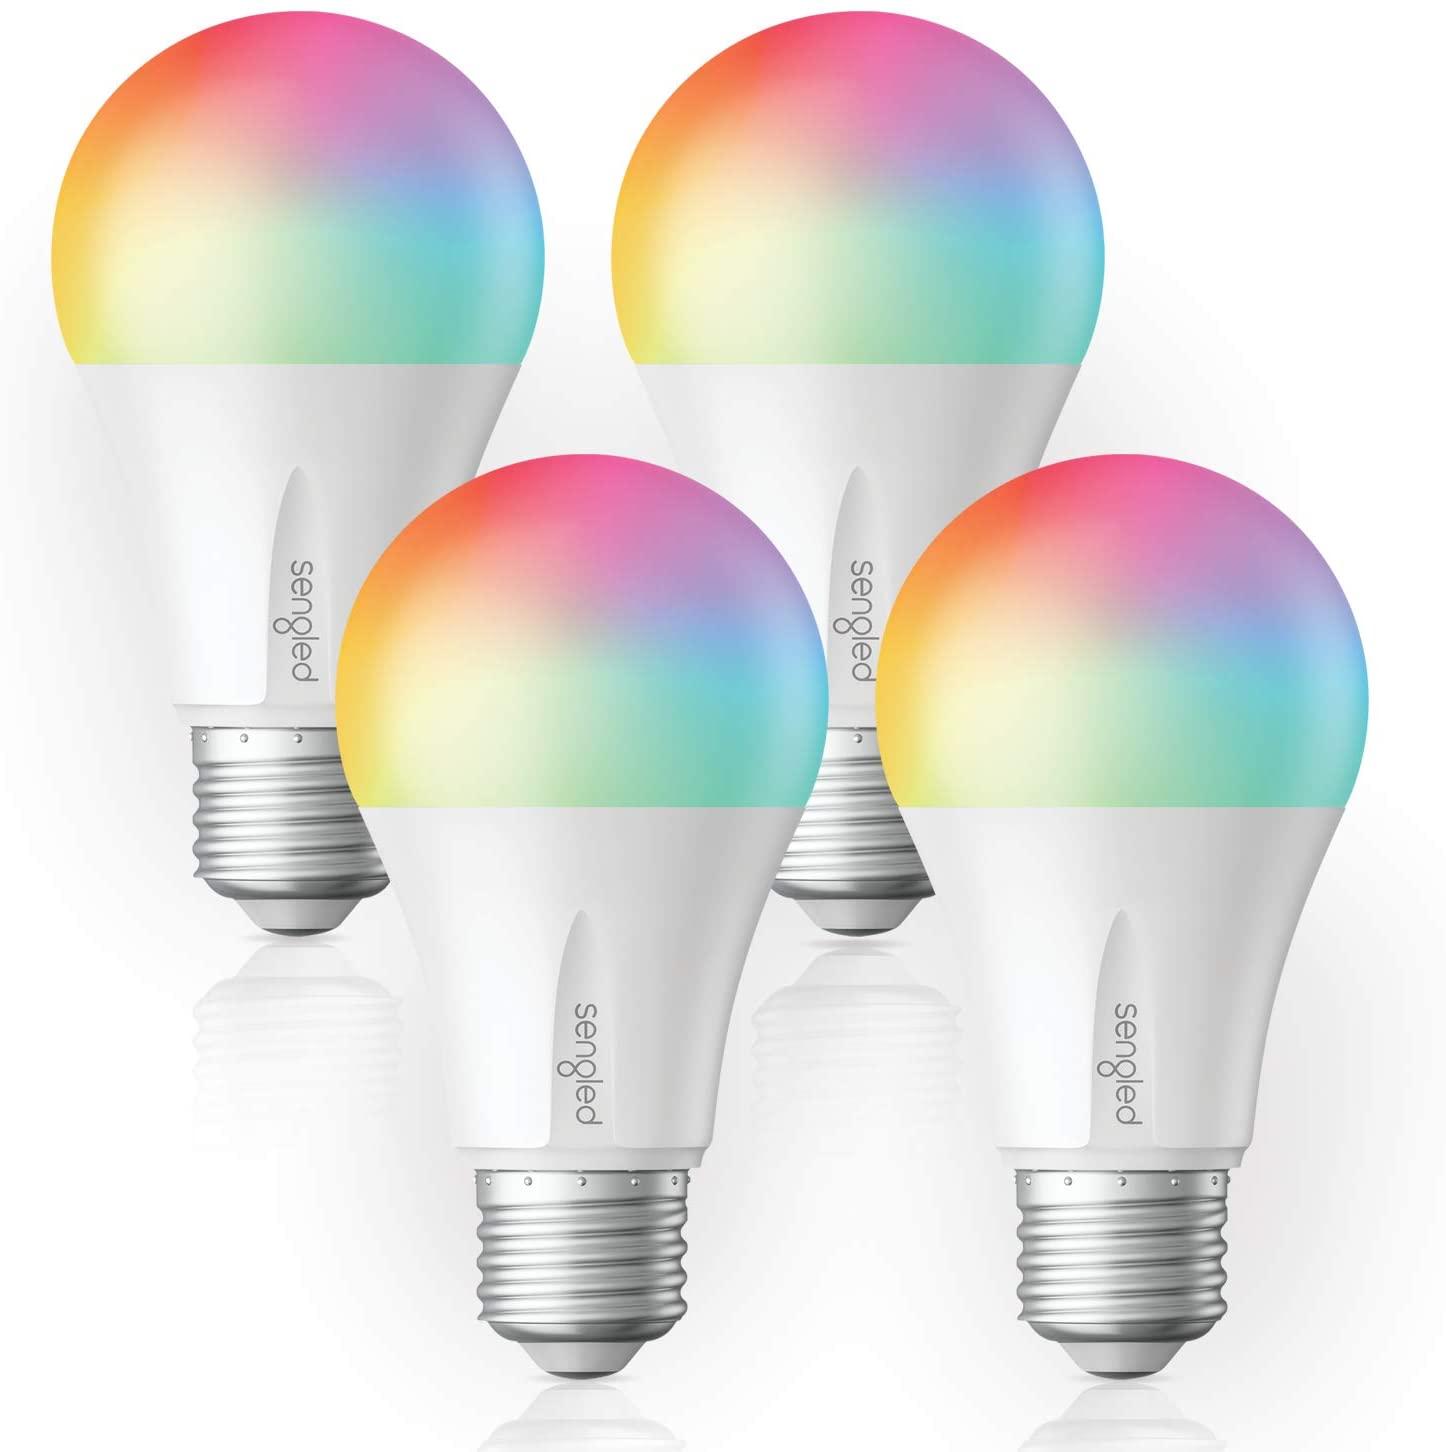 Sengled Smart Color Changing Light Bulbs